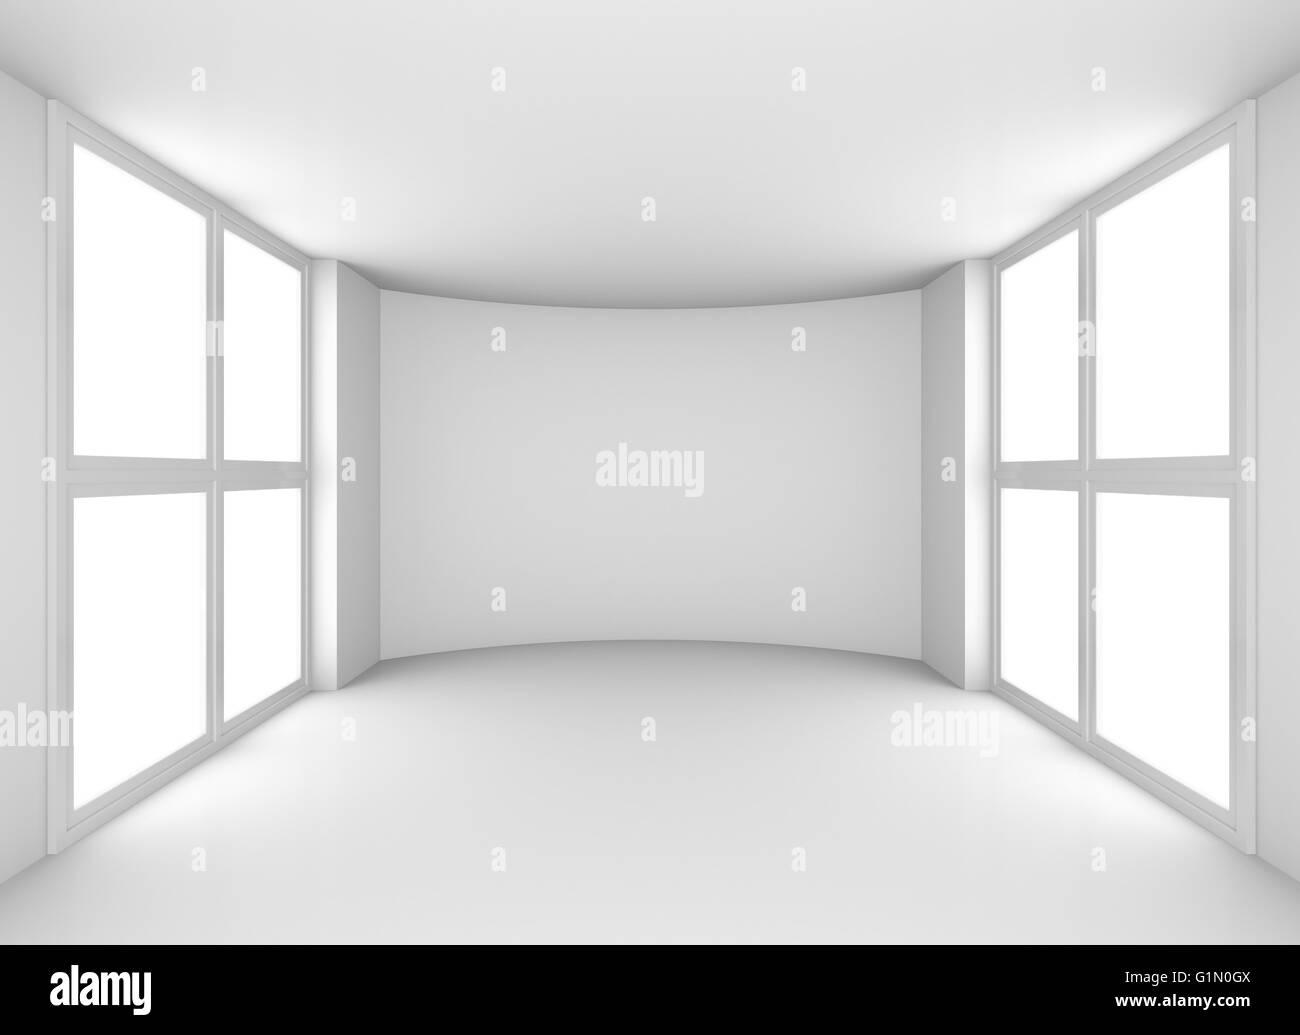 Superb Exhibit Empty White Showroom With Windows Stock Photo Download Free Architecture Designs Scobabritishbridgeorg